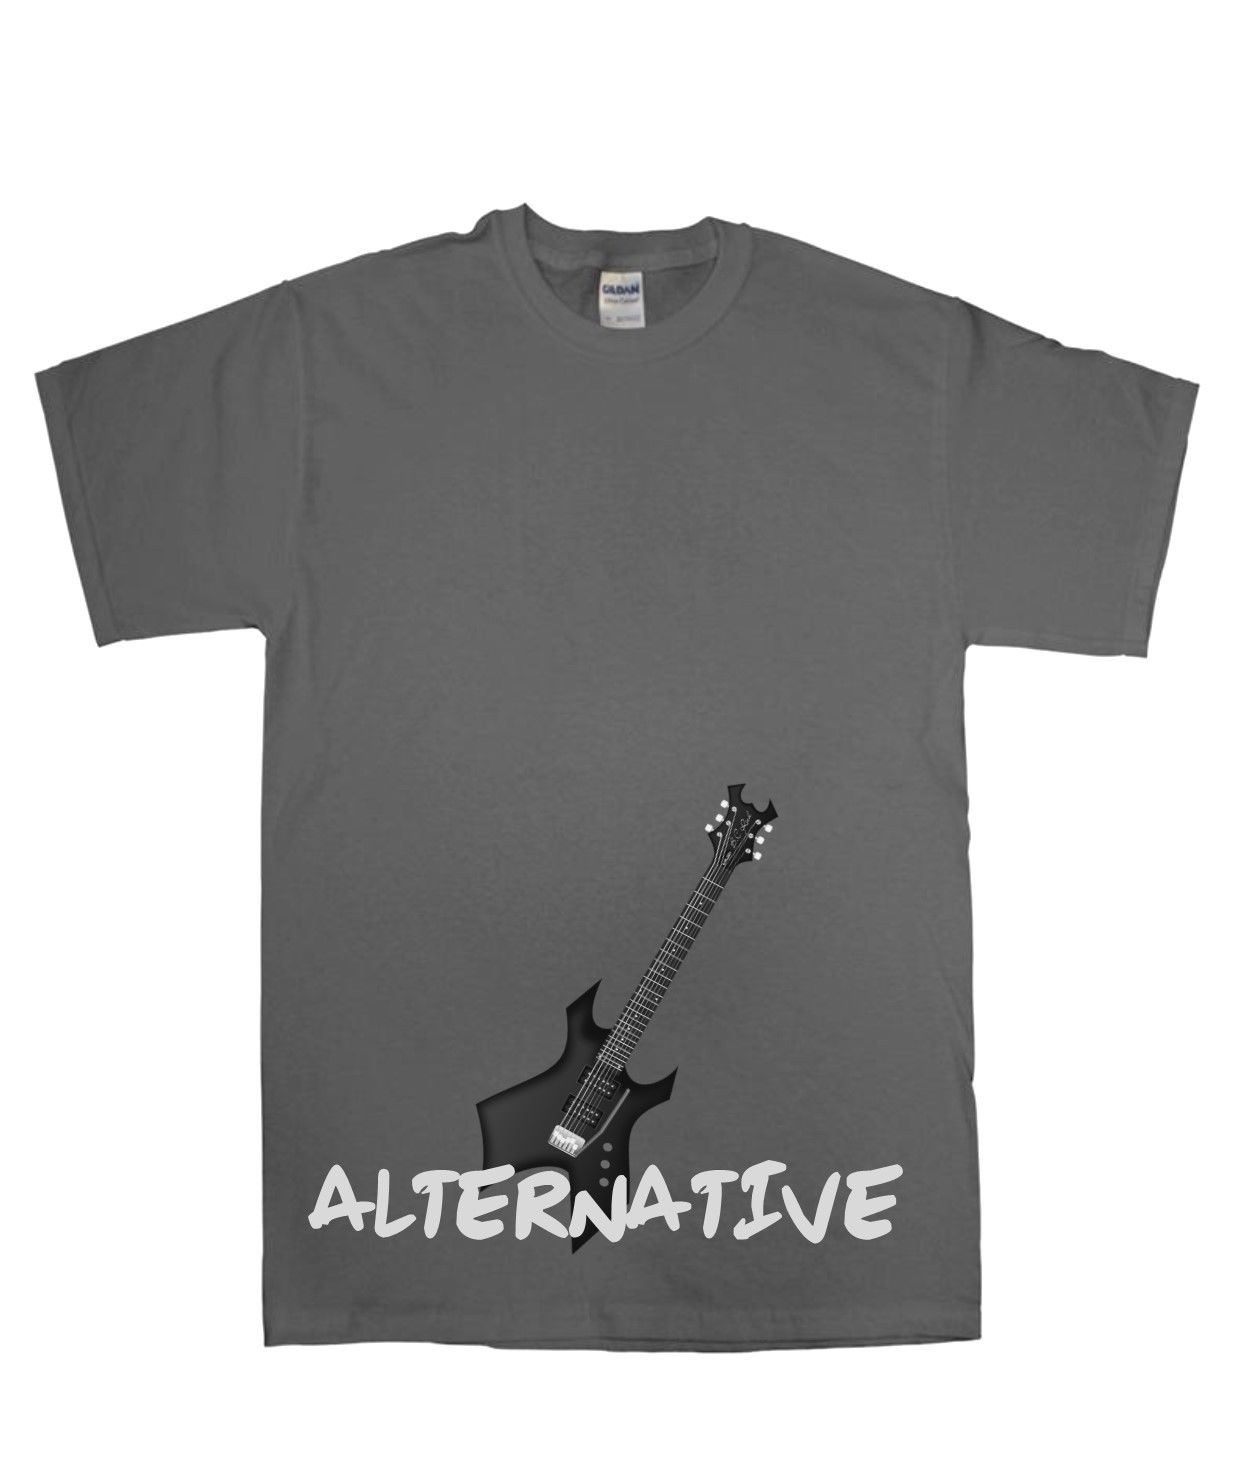 Fun Rock Gift Shirt Guitar Printed Music Indie T Kids Alternative SGqVLUMzjp